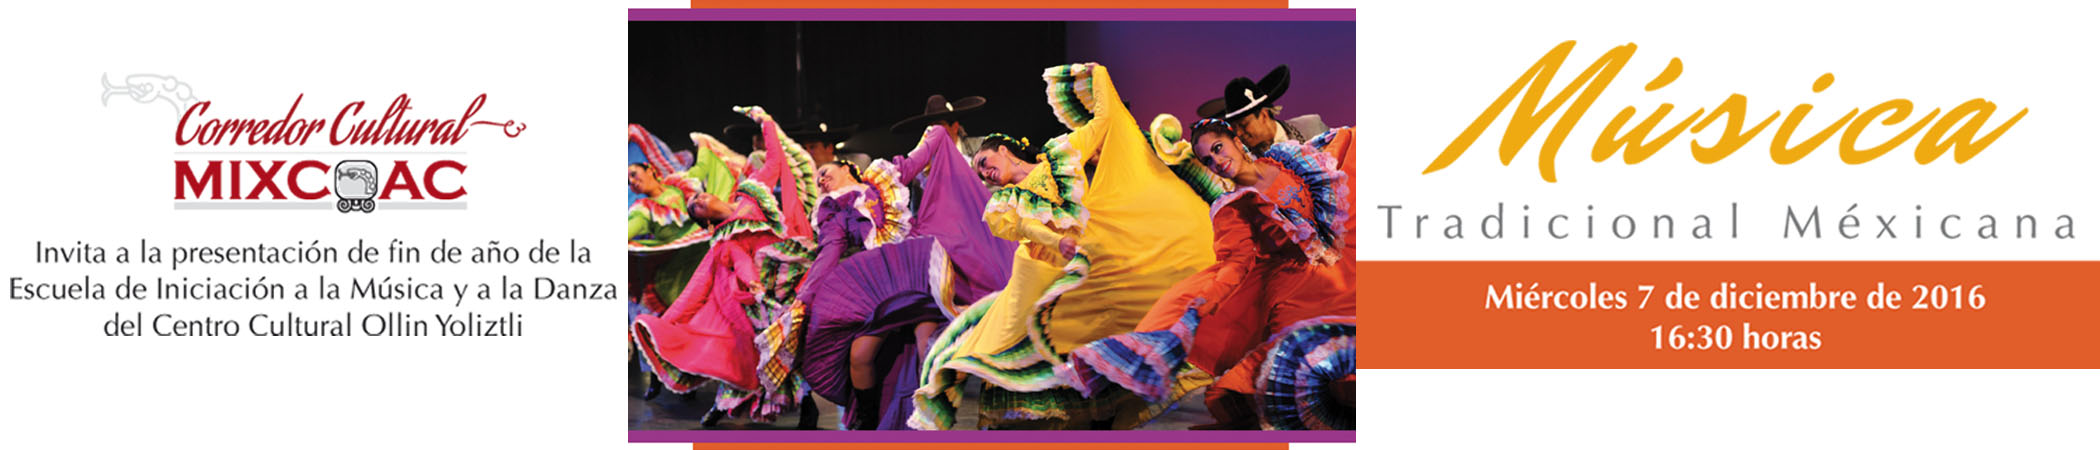 Música tradicional Mexicana